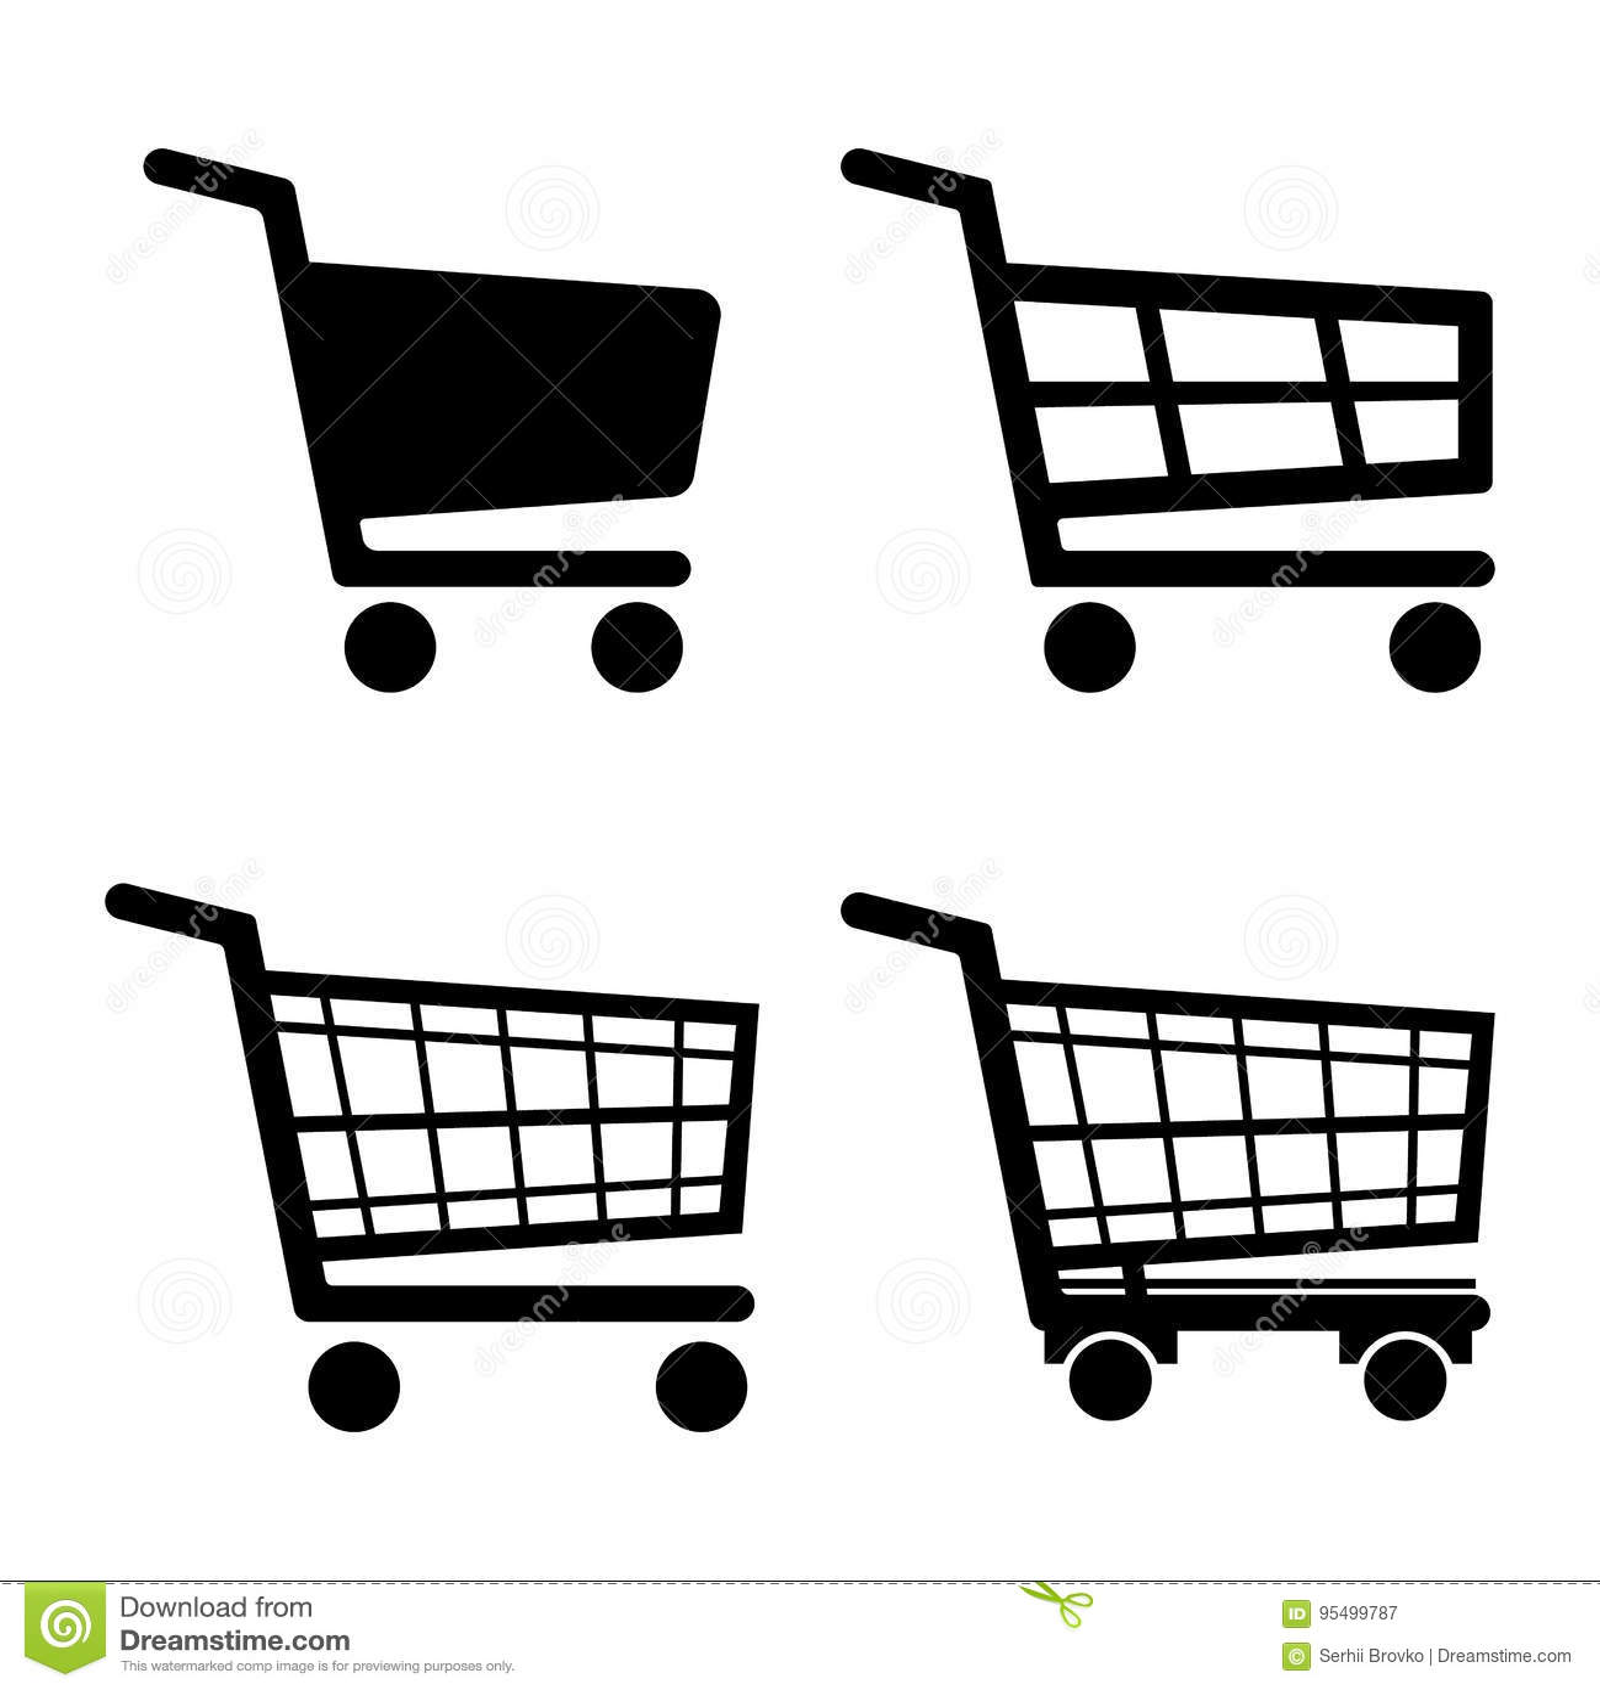 Shopping Cart Icon set icon isolated on white background. Vector illustration.